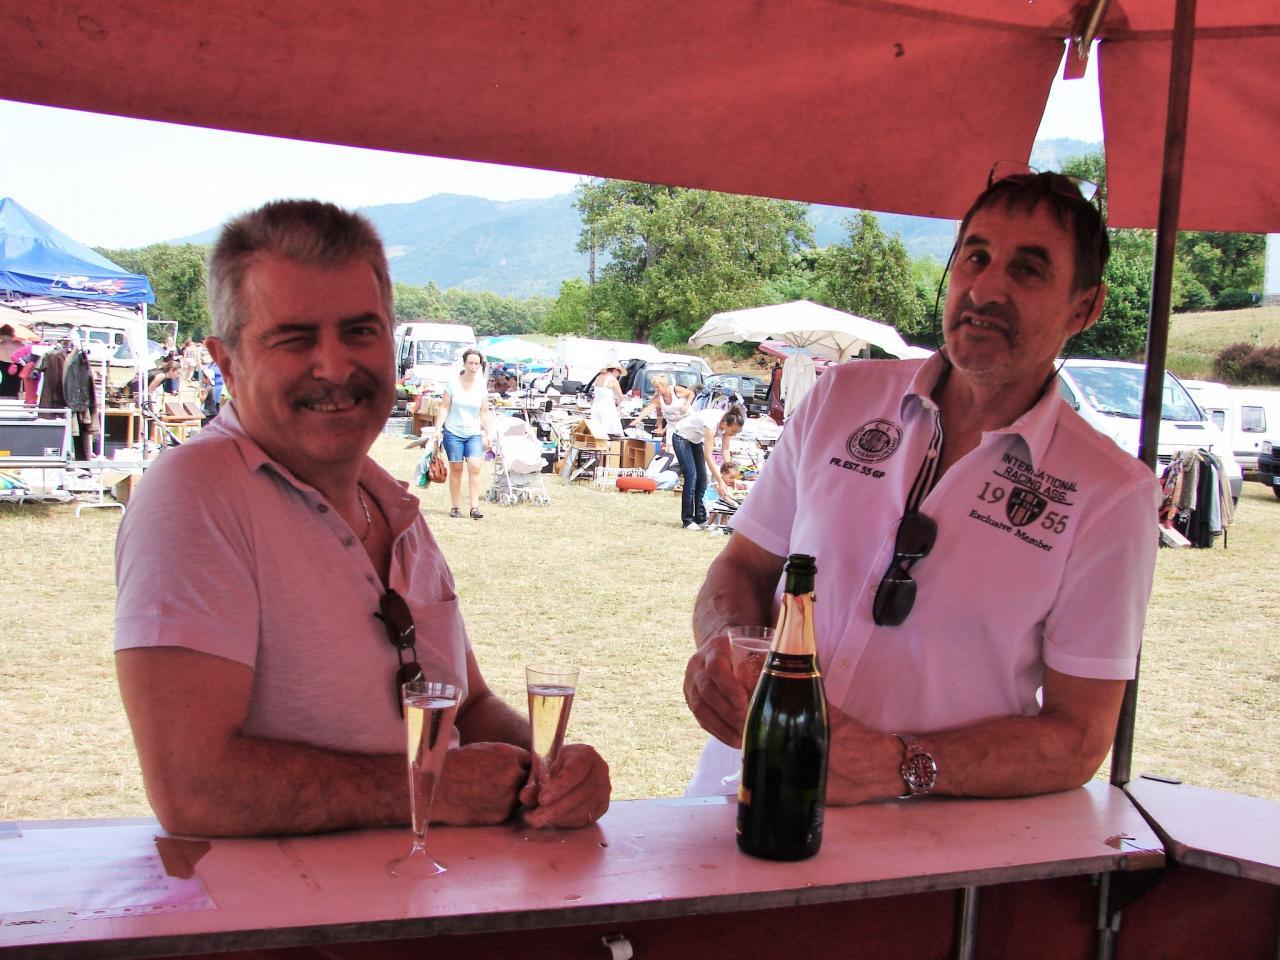 Brocate à Brenthonne - Juillet 2015